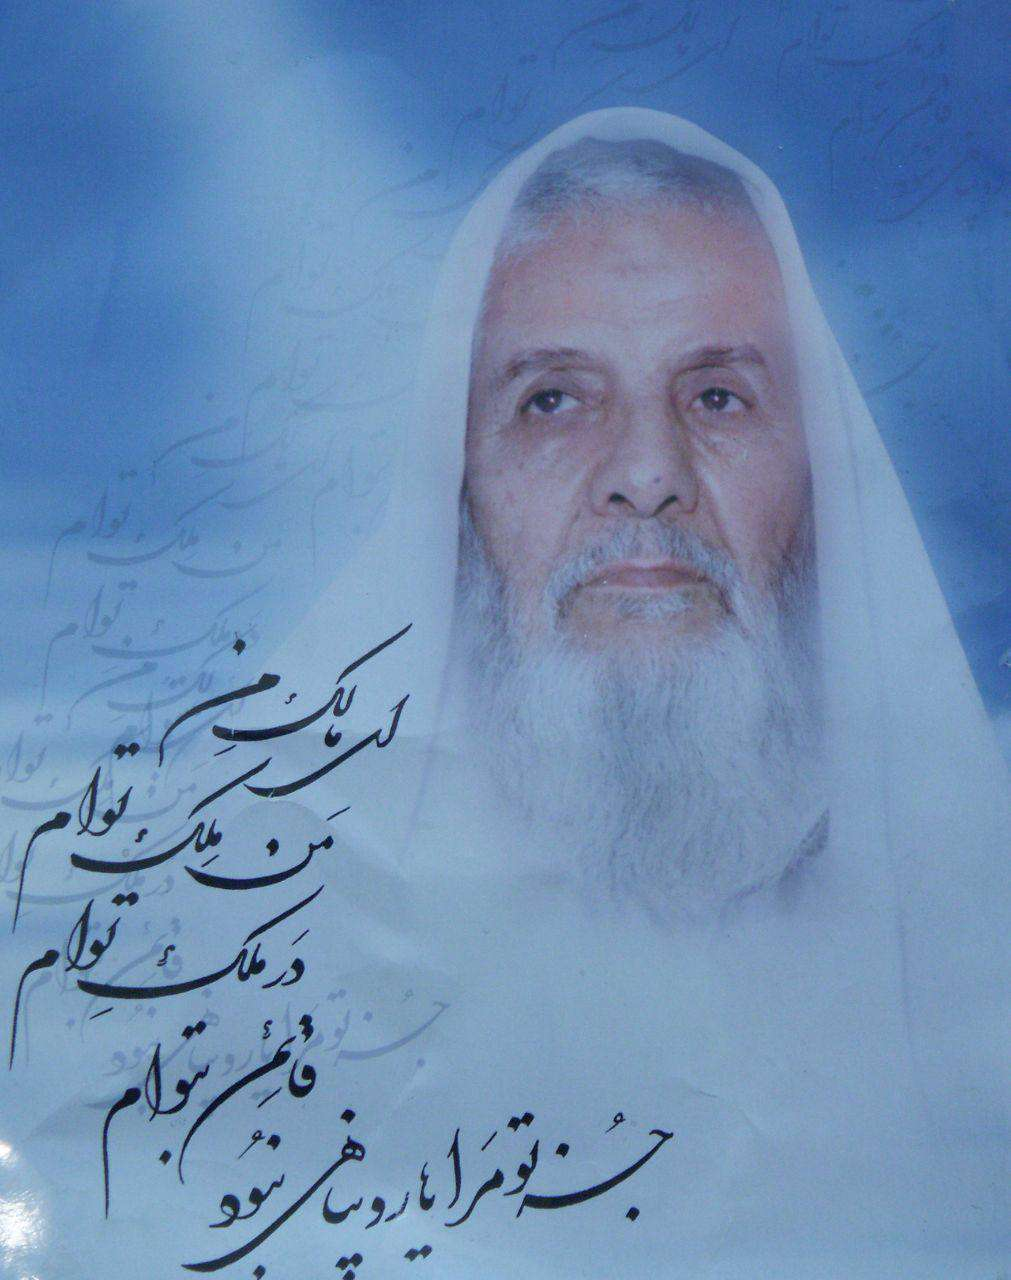 علامه محمد باقر حکمت نیا رحمت الله علیه